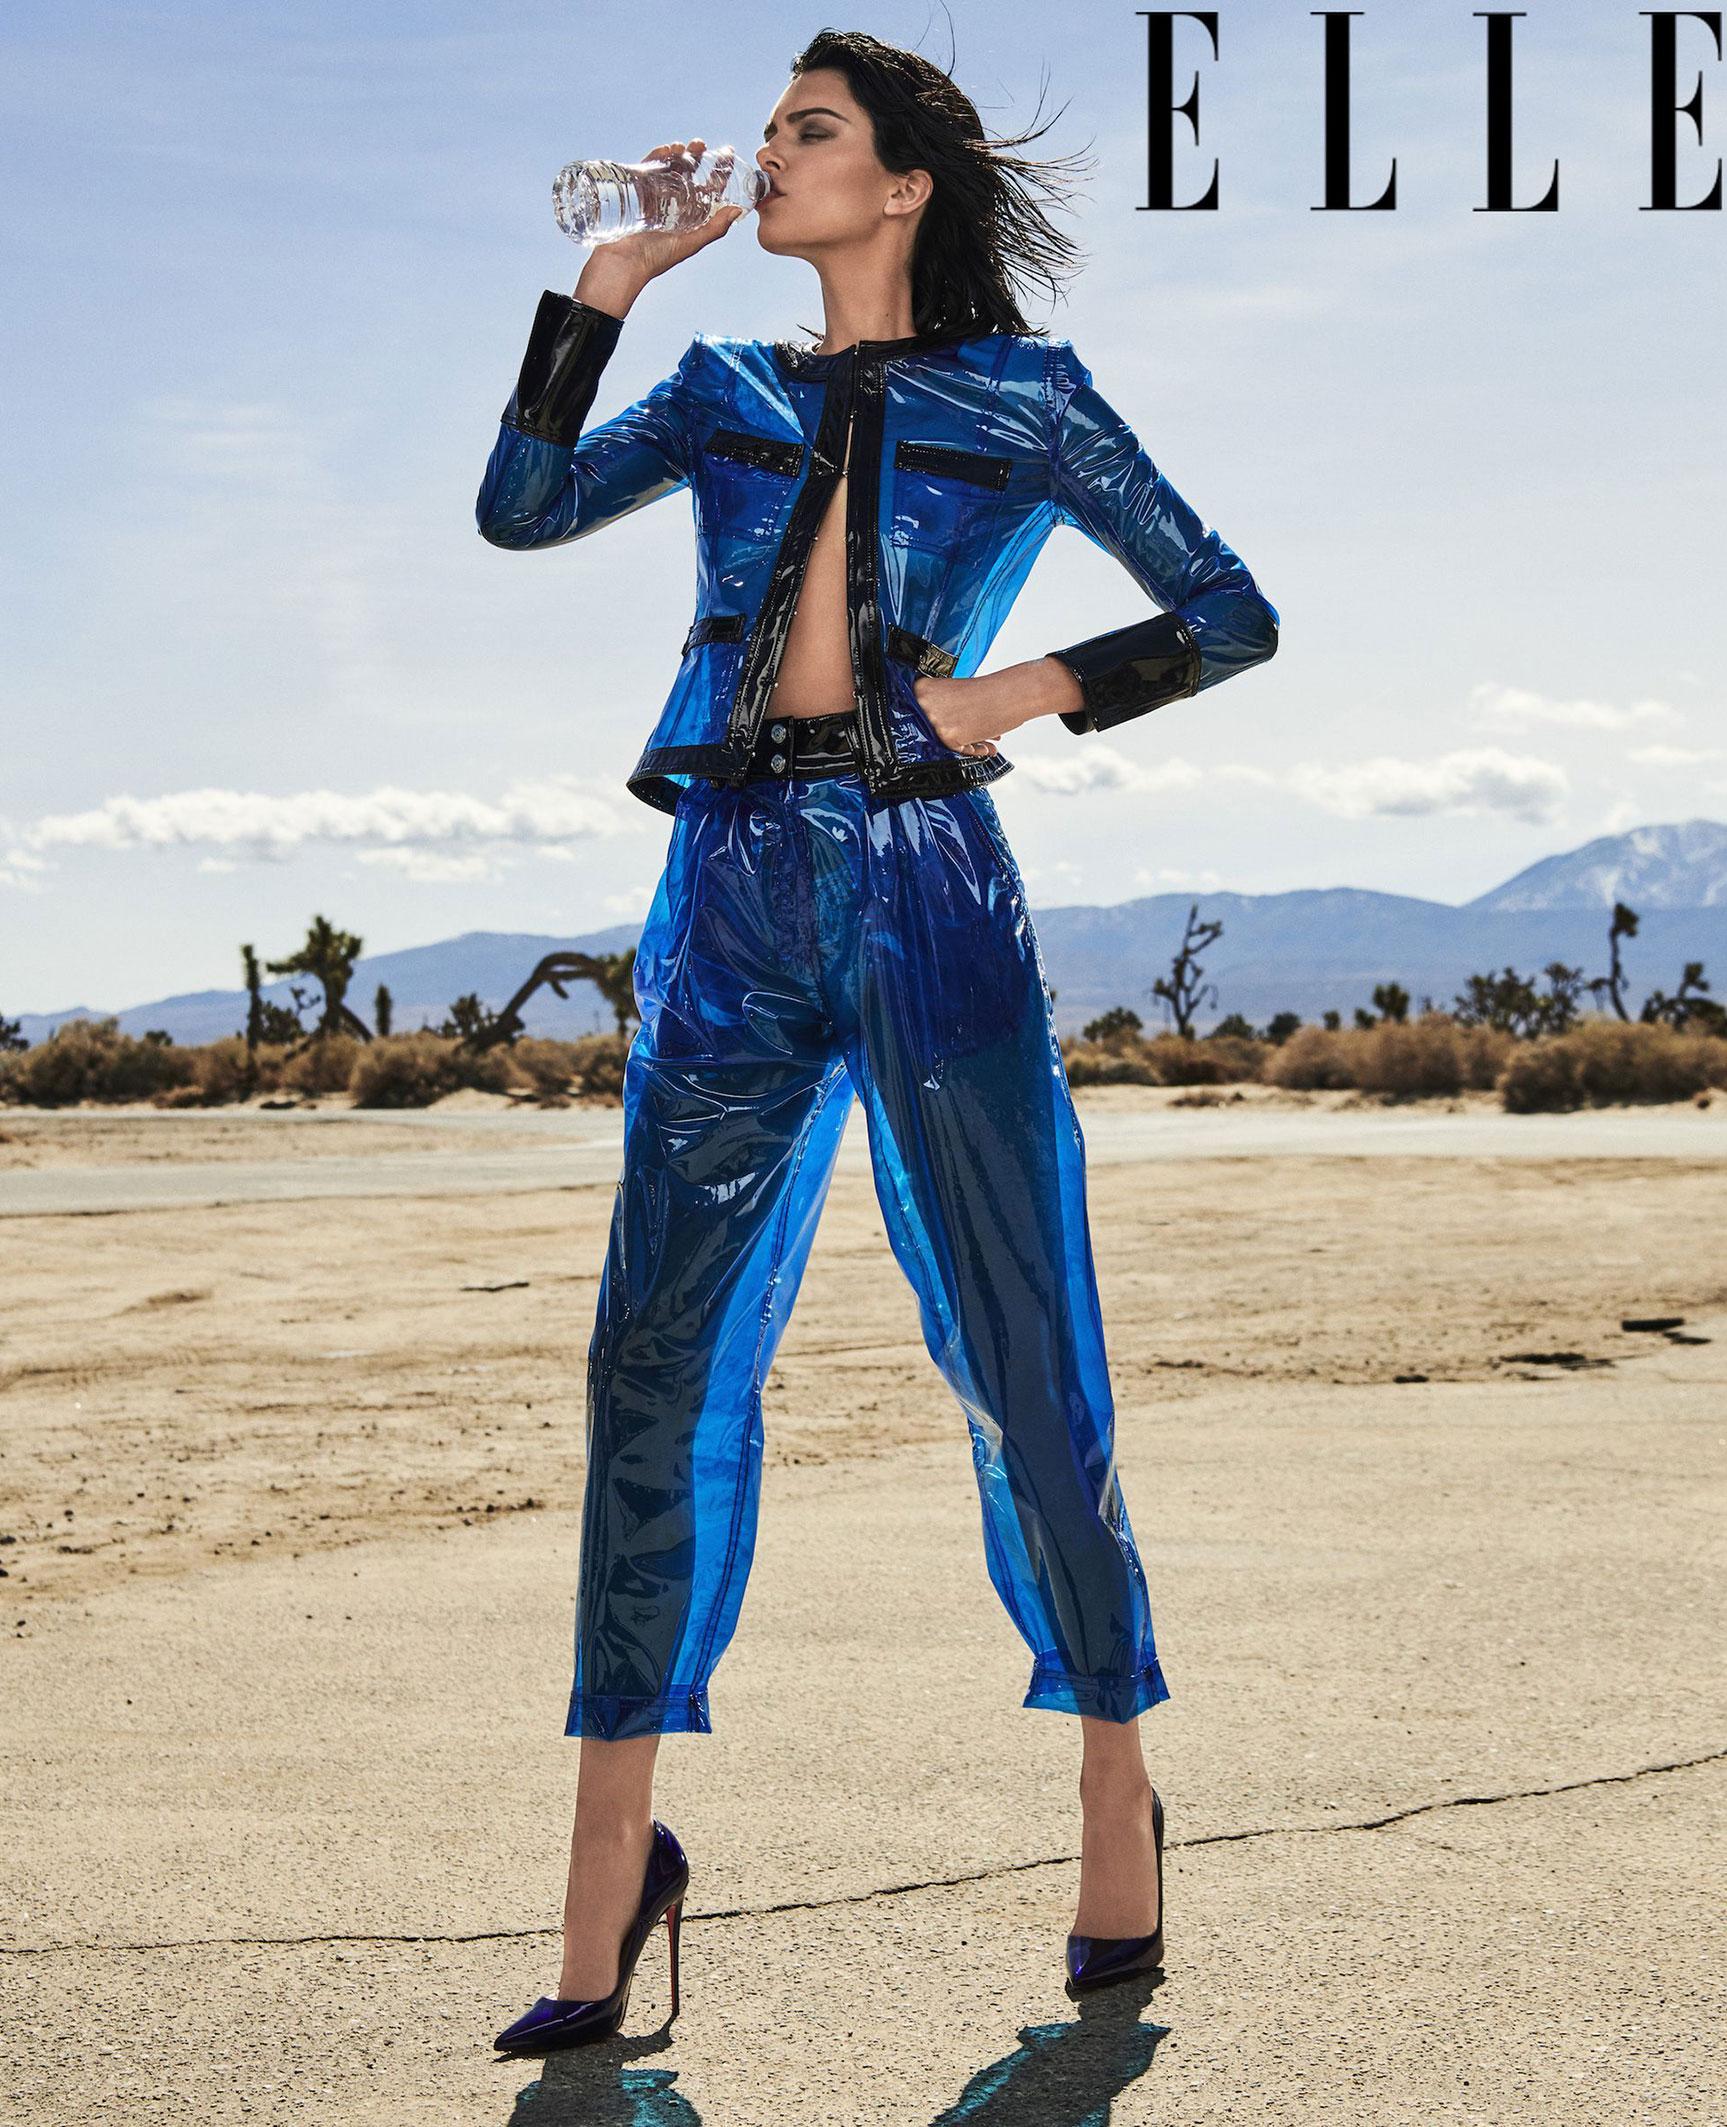 Kendall Jenner by Chris Colls / Elle USA june 2018